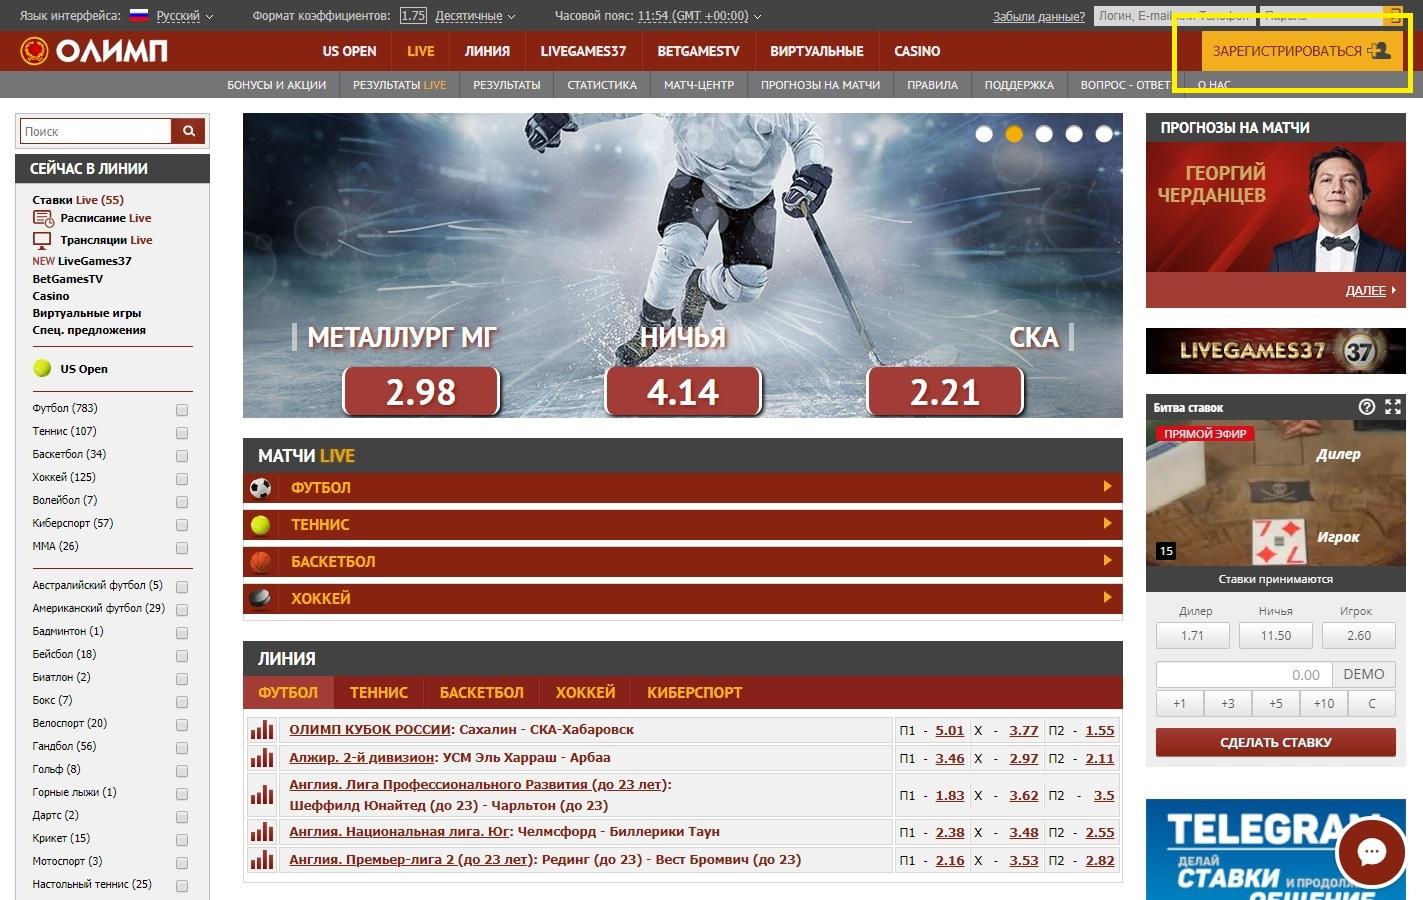 www.olimp.com  - обзор сайта